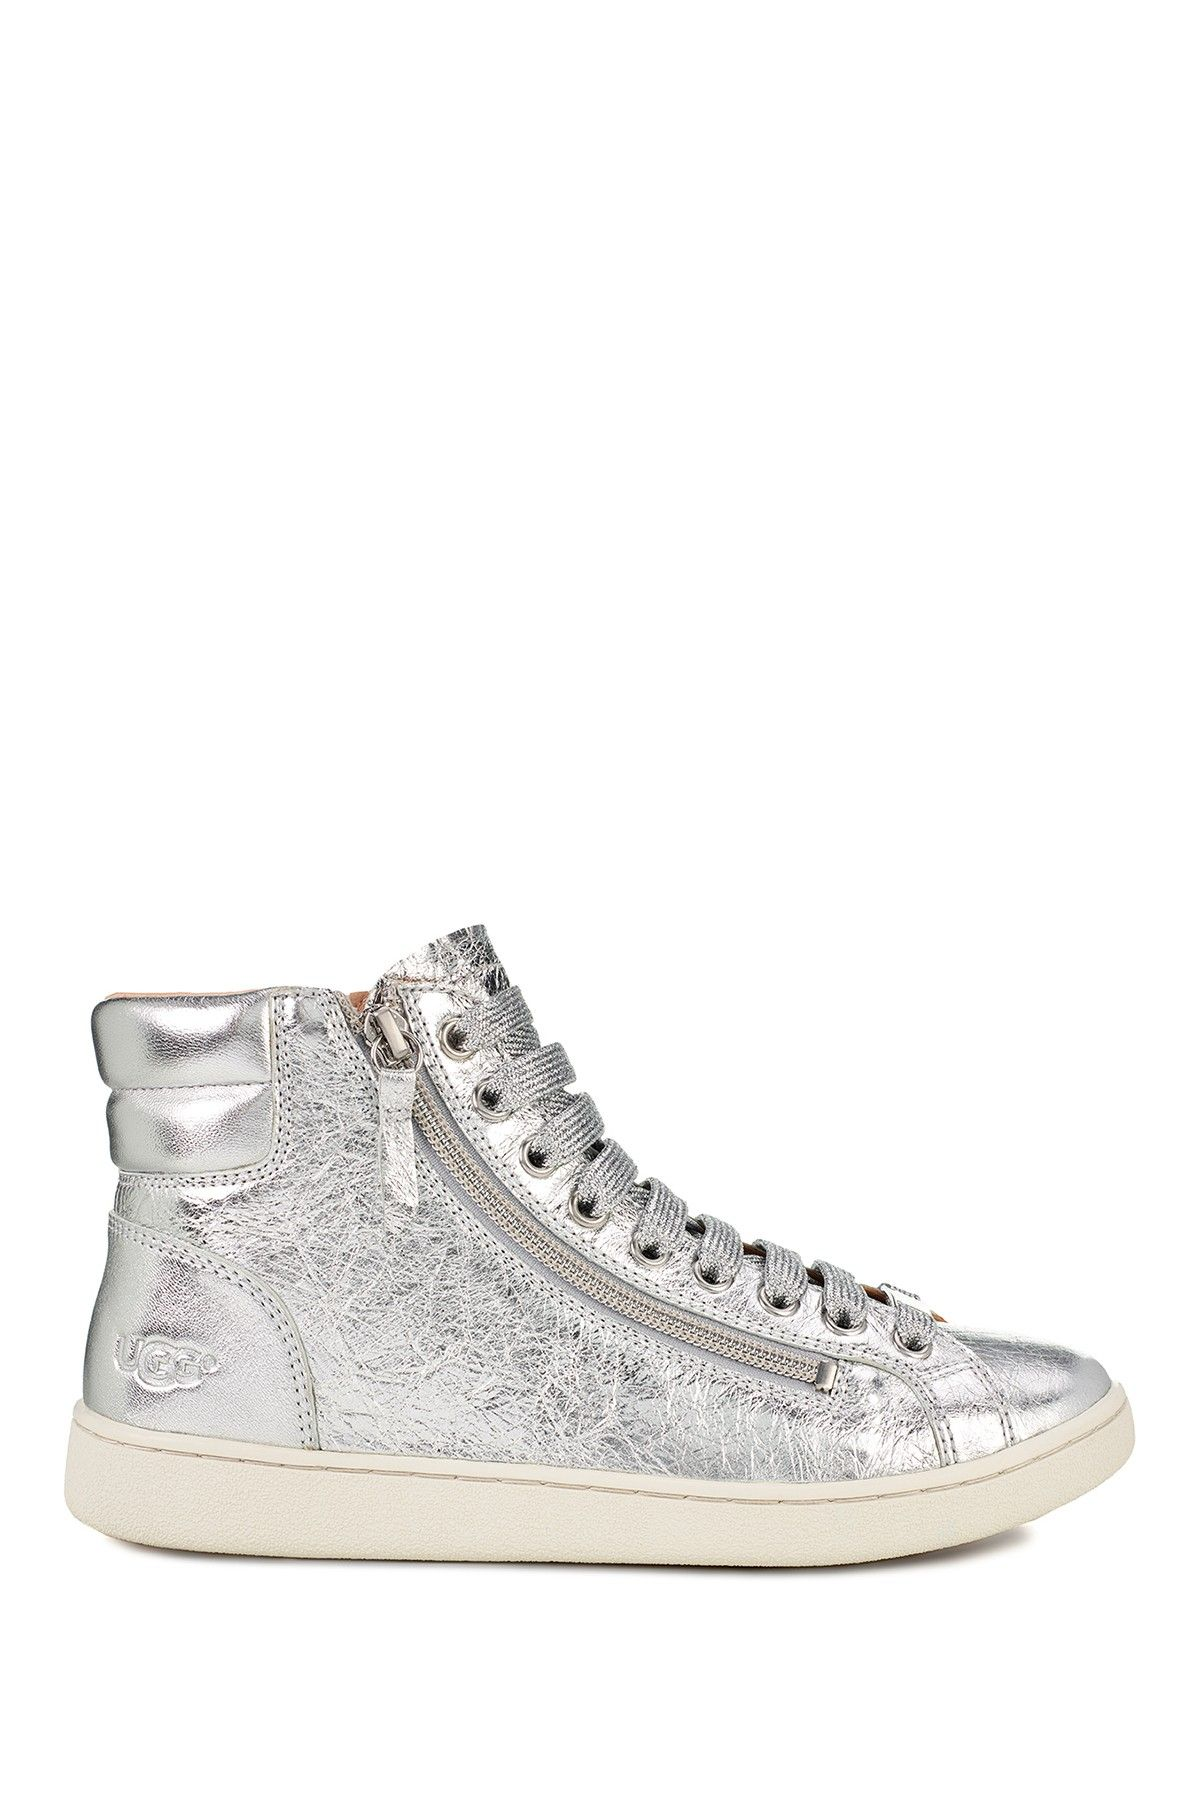 UGG | Olive Metallic Sneaker | Metallic